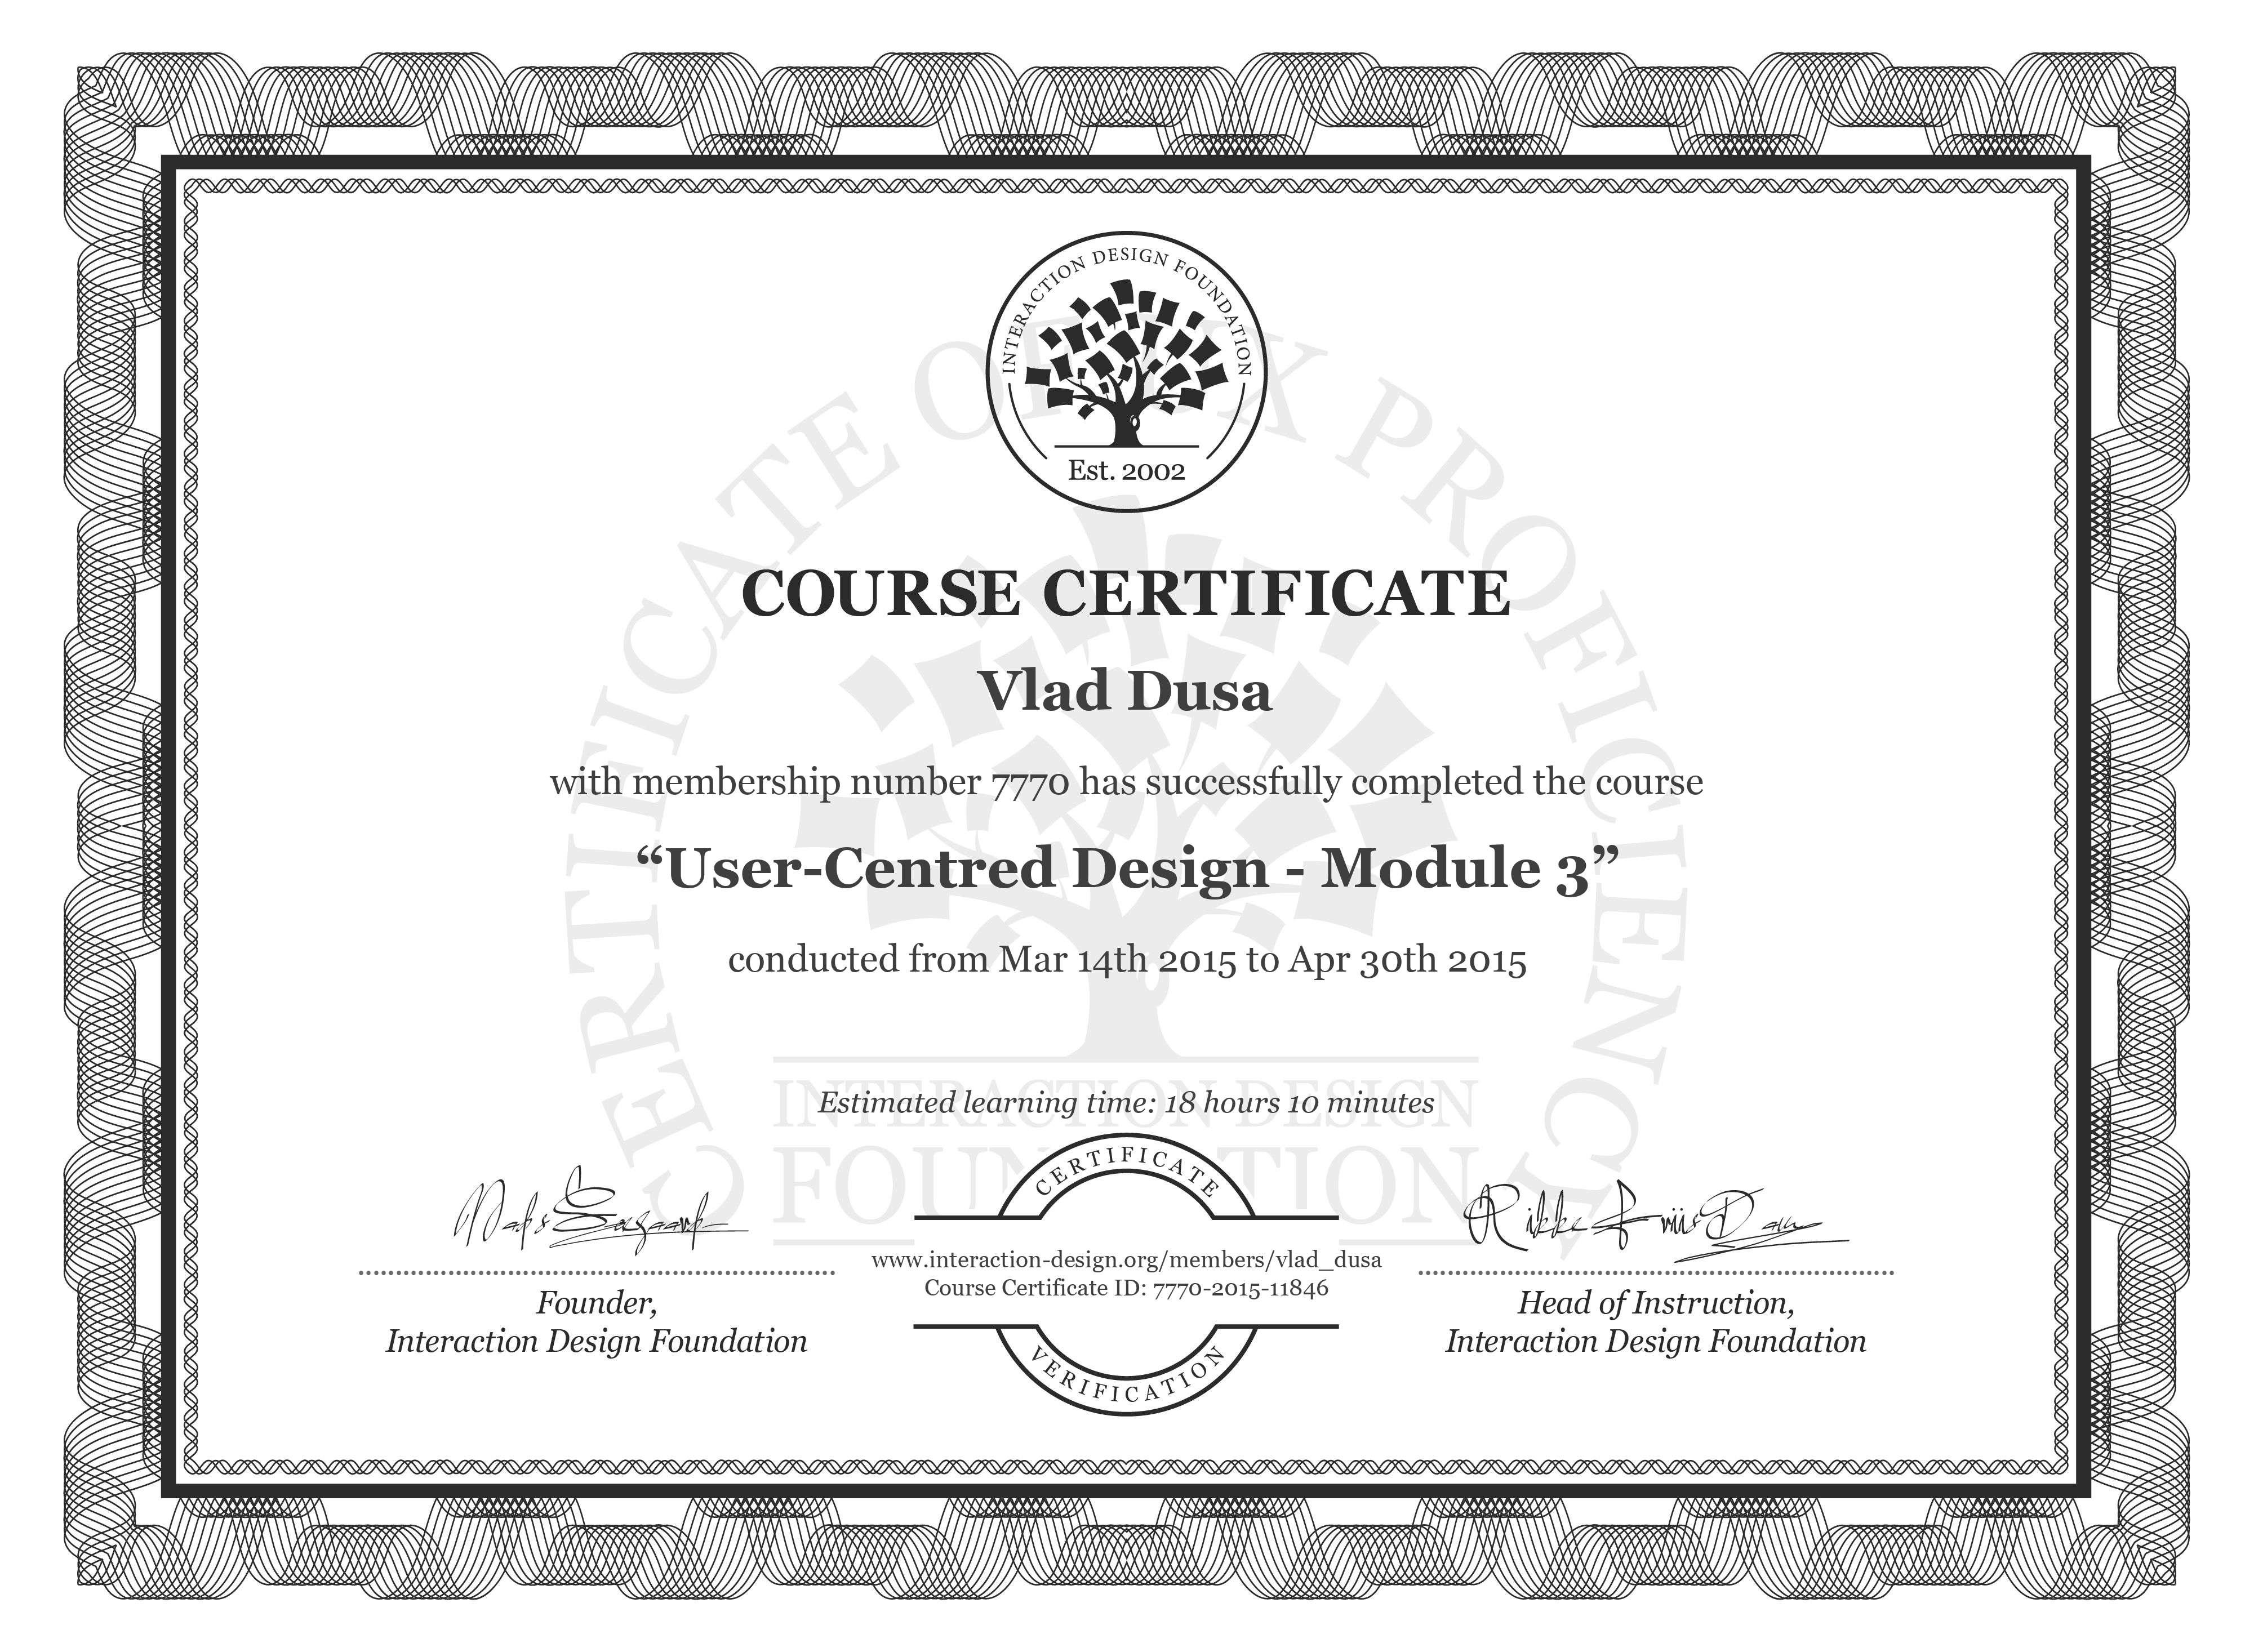 Vlad Dusa's Course Certificate: User-Centred Design - Module 3